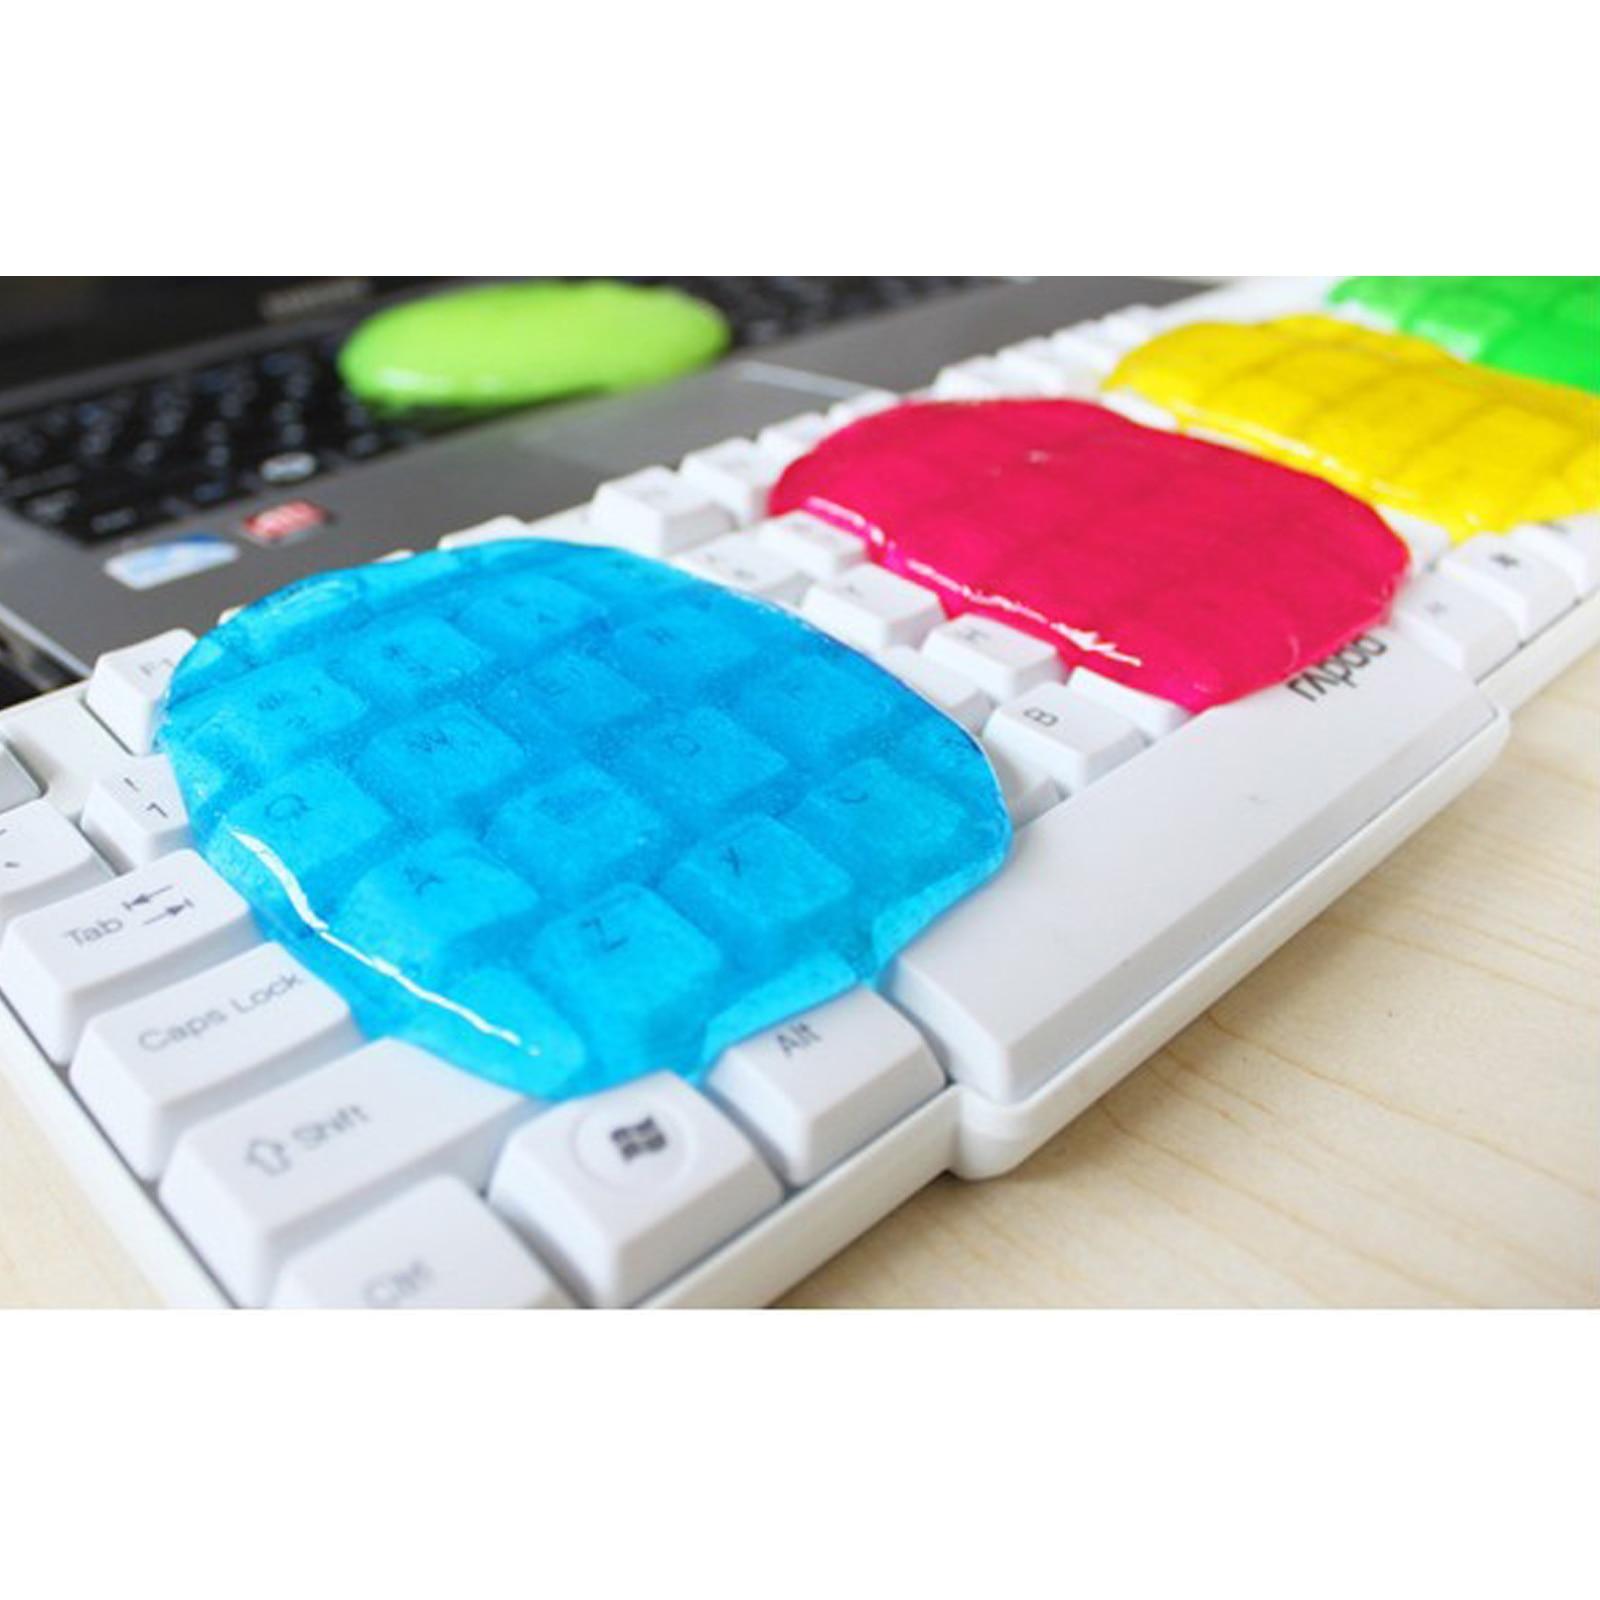 Multifunction Soft Safe Car Sticky Clean Glue Gum Gel Cleaning Auto Interior Outlet Keyboard Dust Cleaner Microfiber Sponge Gel